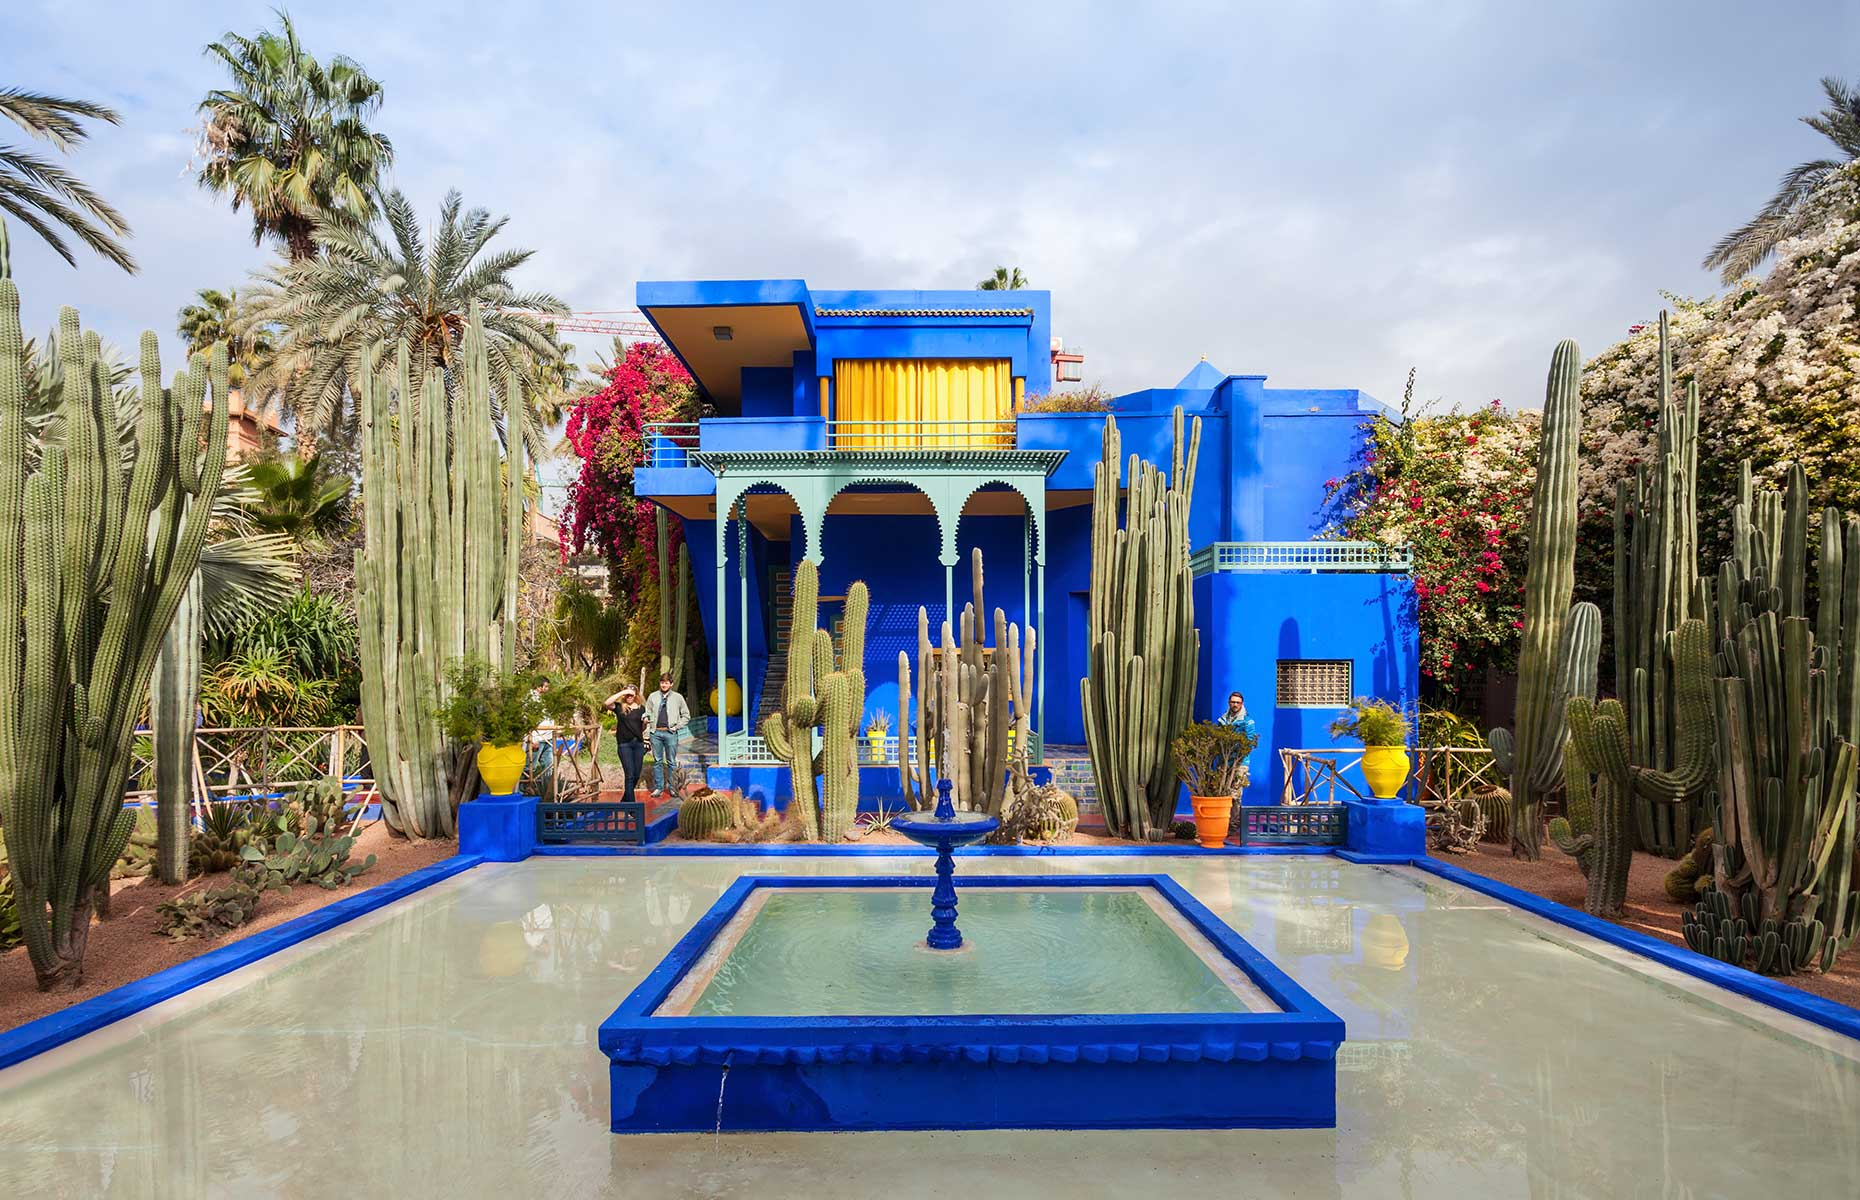 Cobalt Blue Jardin de Majorelle in Marrakech Morocco